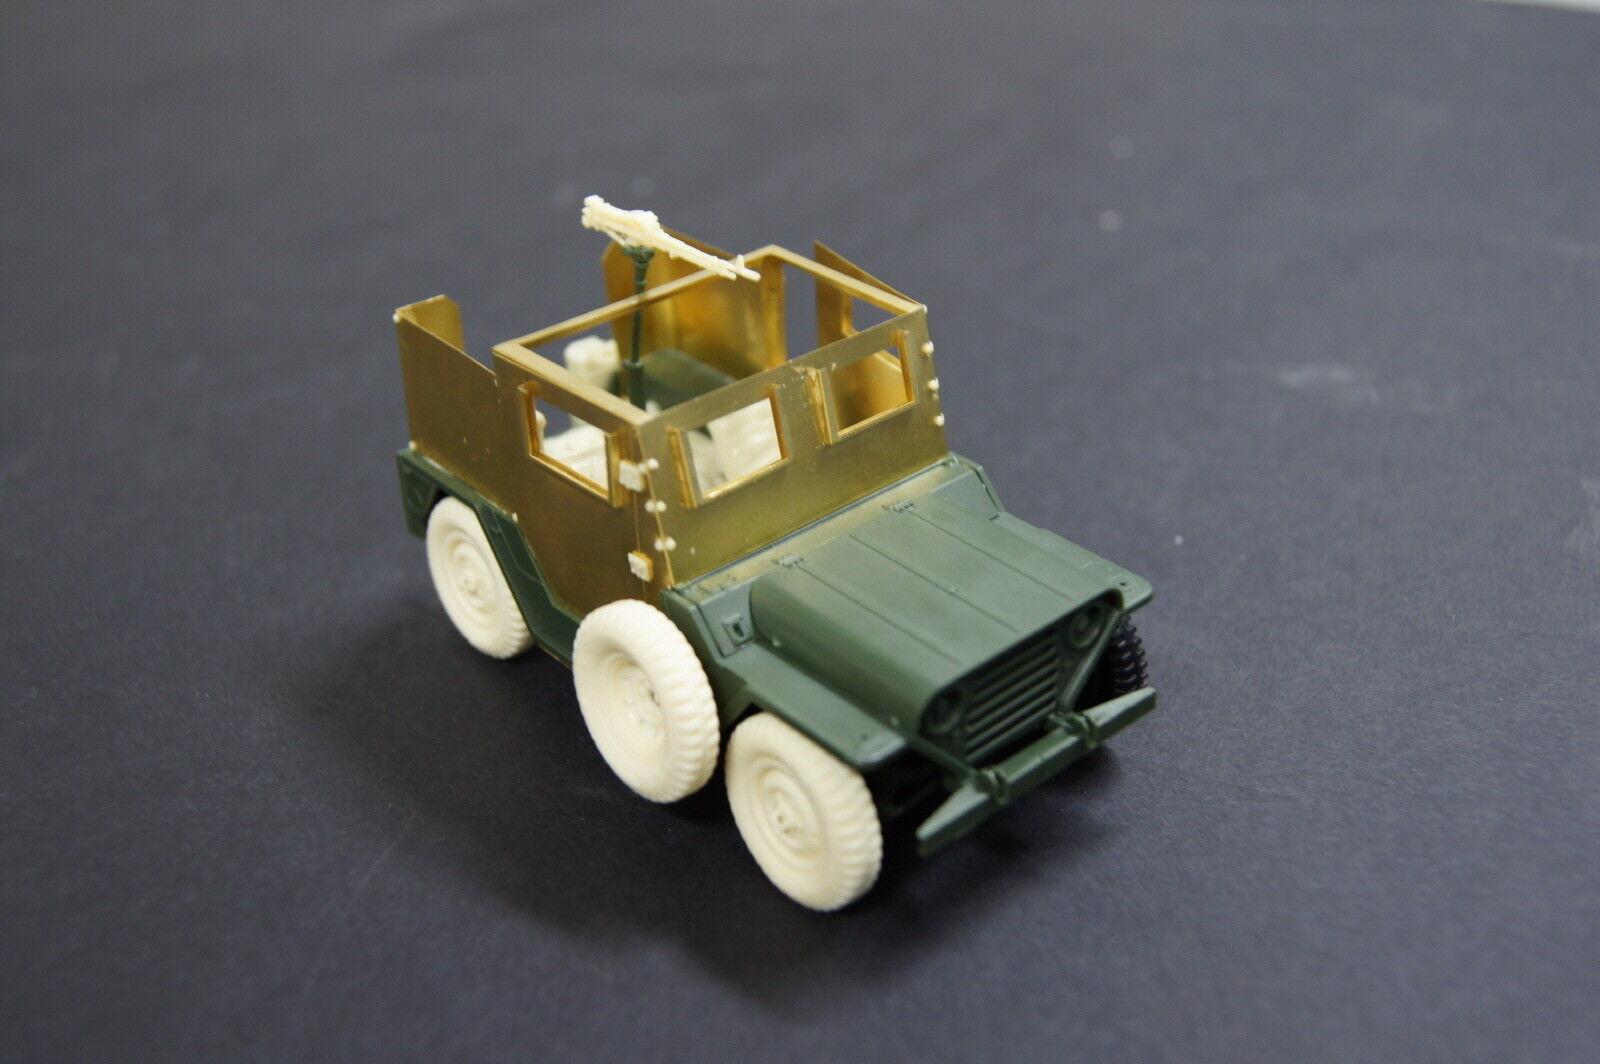 DT35-022 1 35 M151 Gunjeep conversion kit